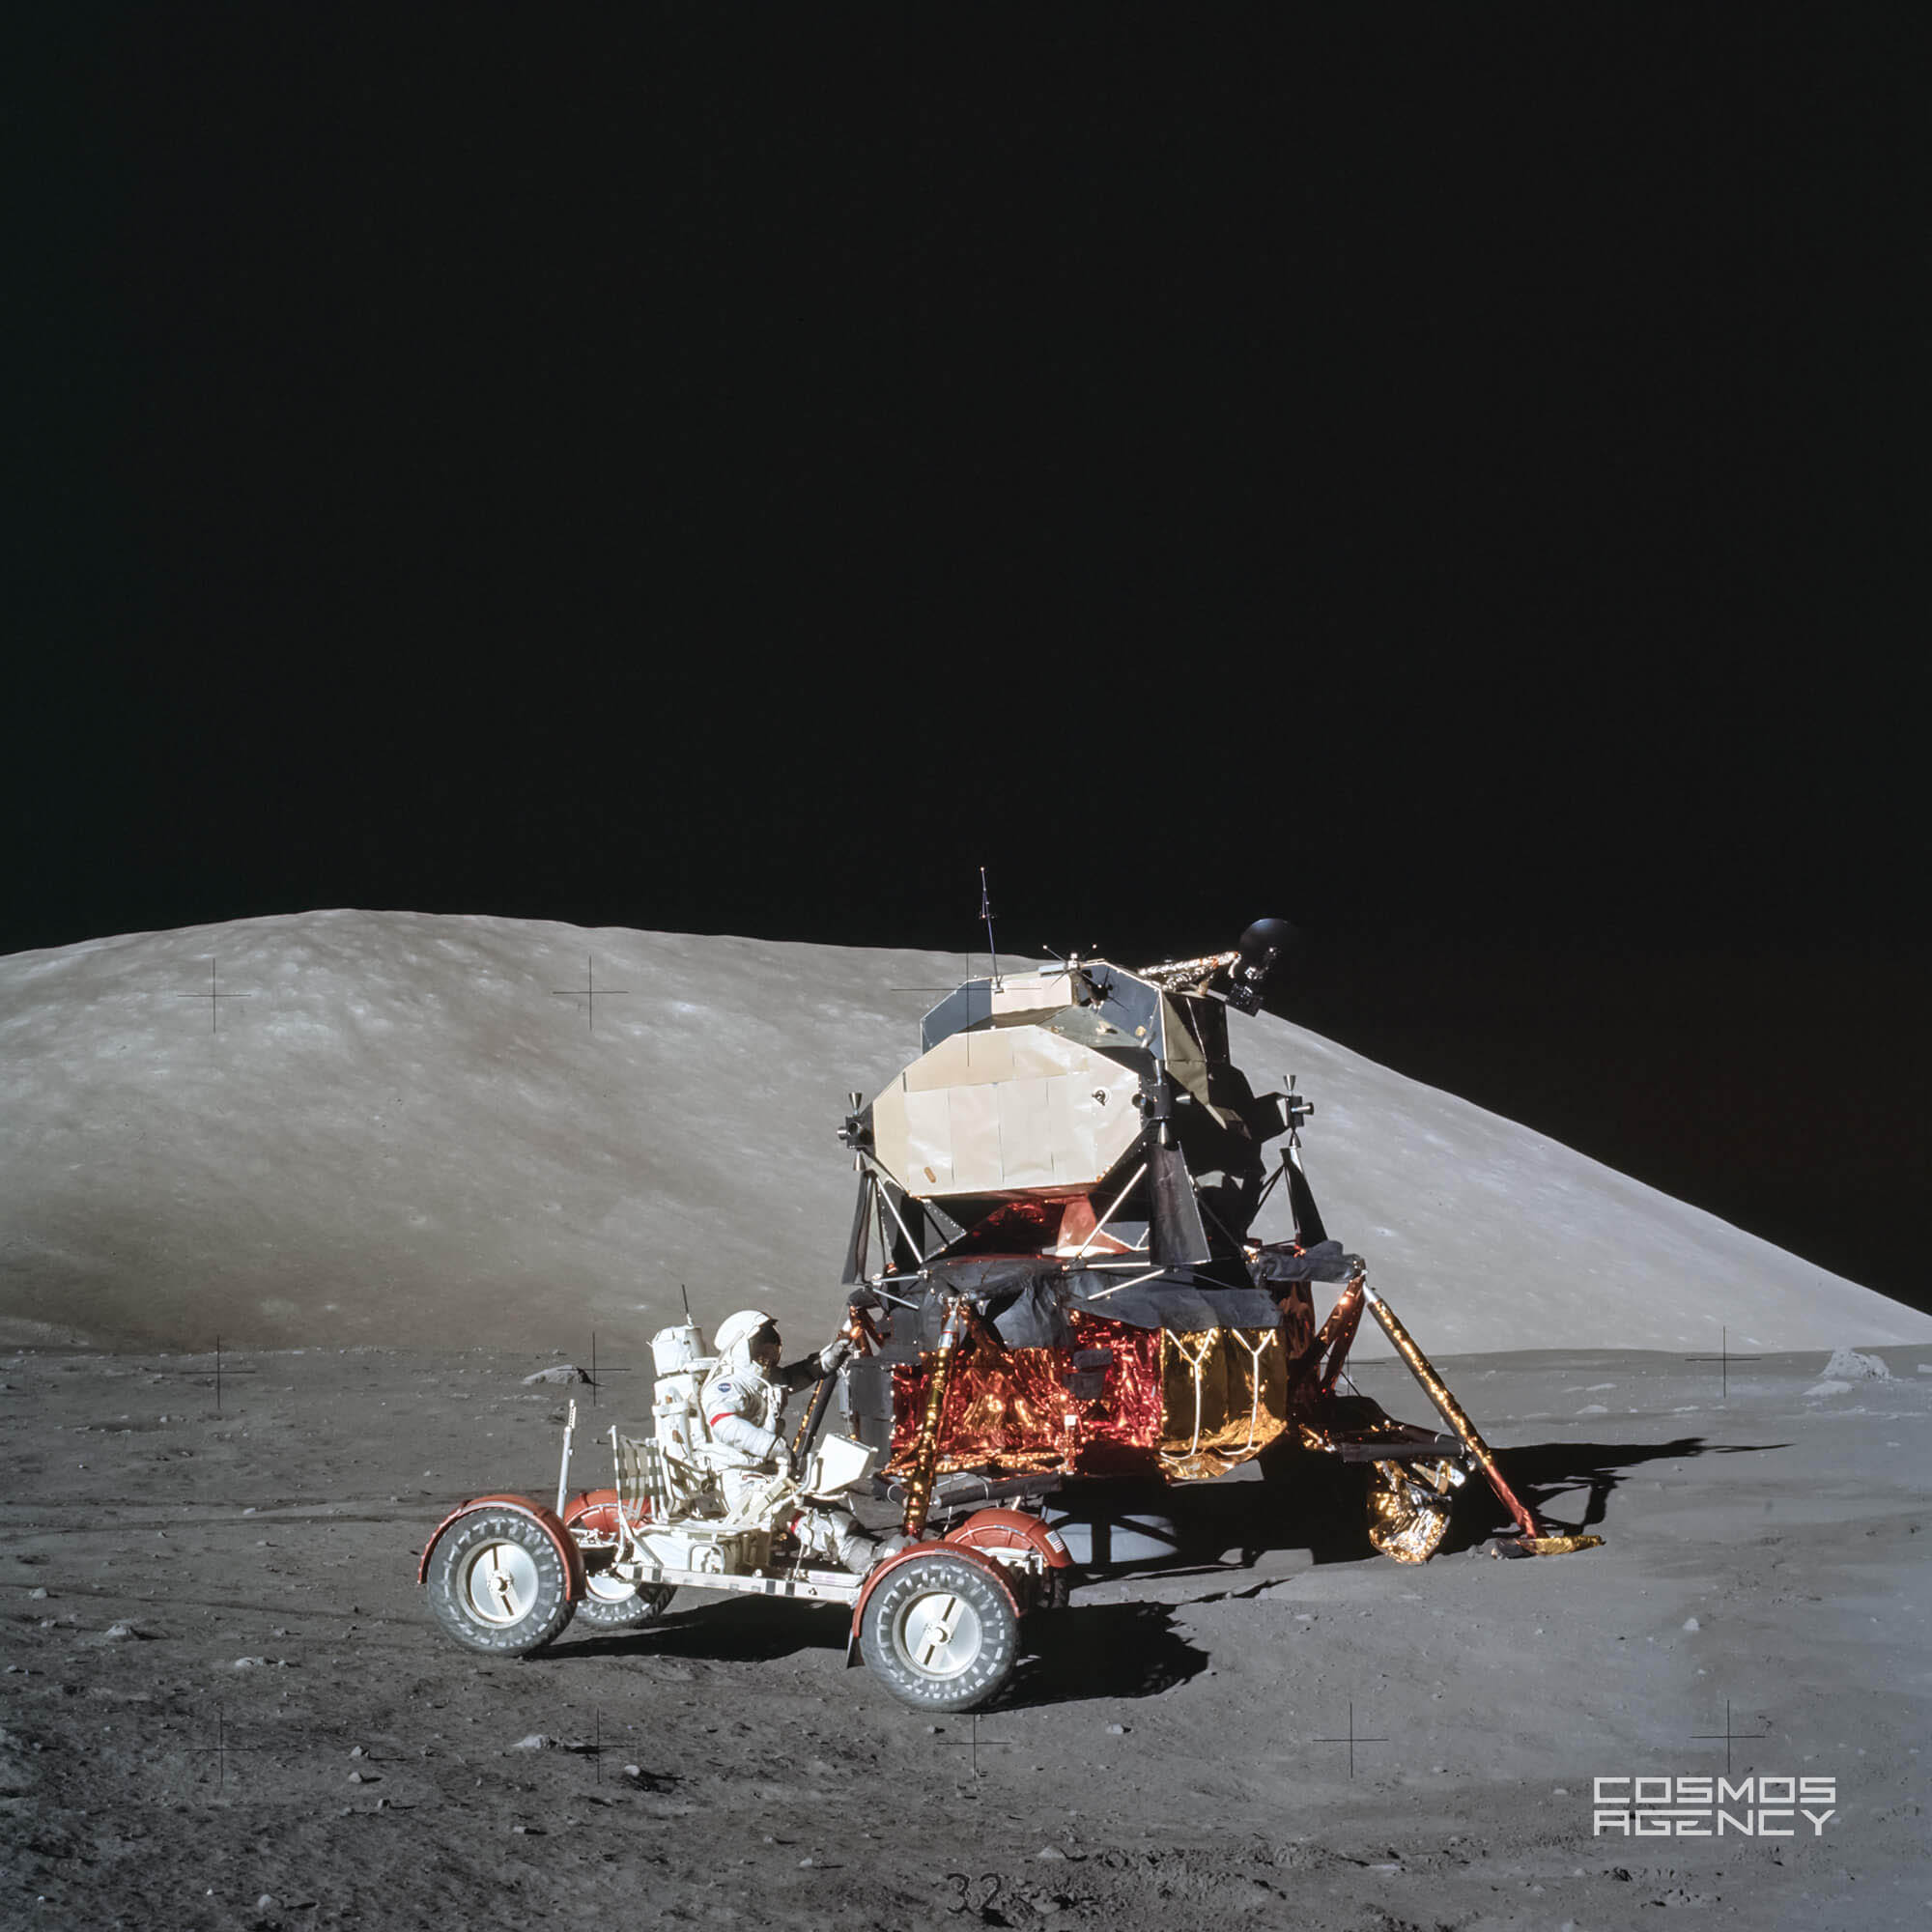 Астронавт NASA Юджин Сернан тестирует Лунный ровер около Лунного модуля, Аполлон 17, 1972